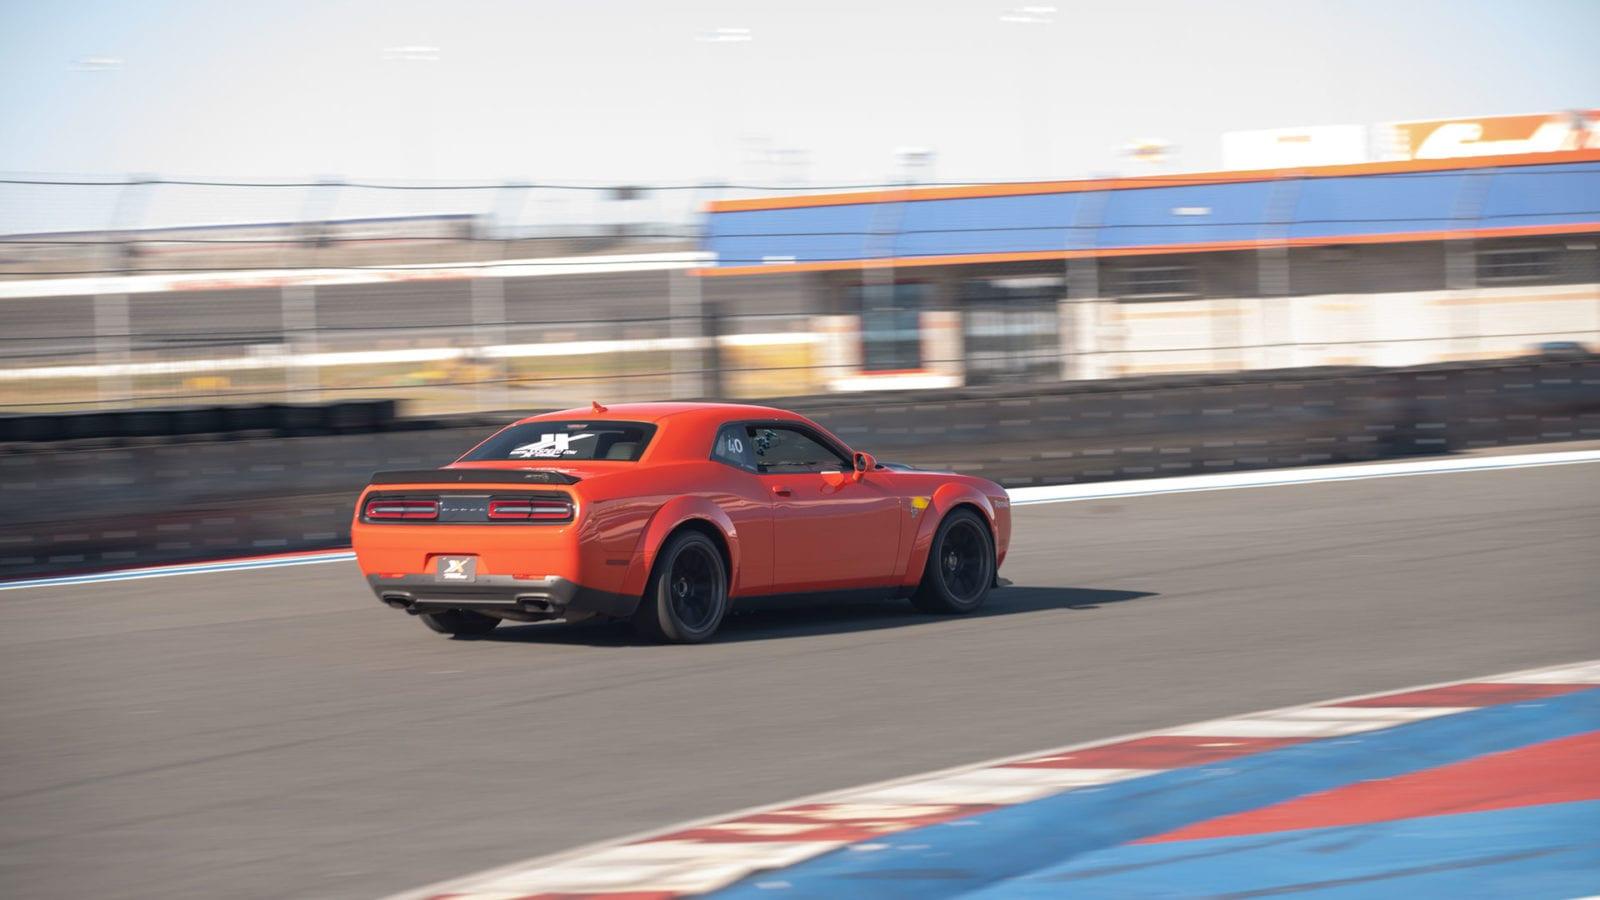 Dodge Hellcat Widebody on a racetrack